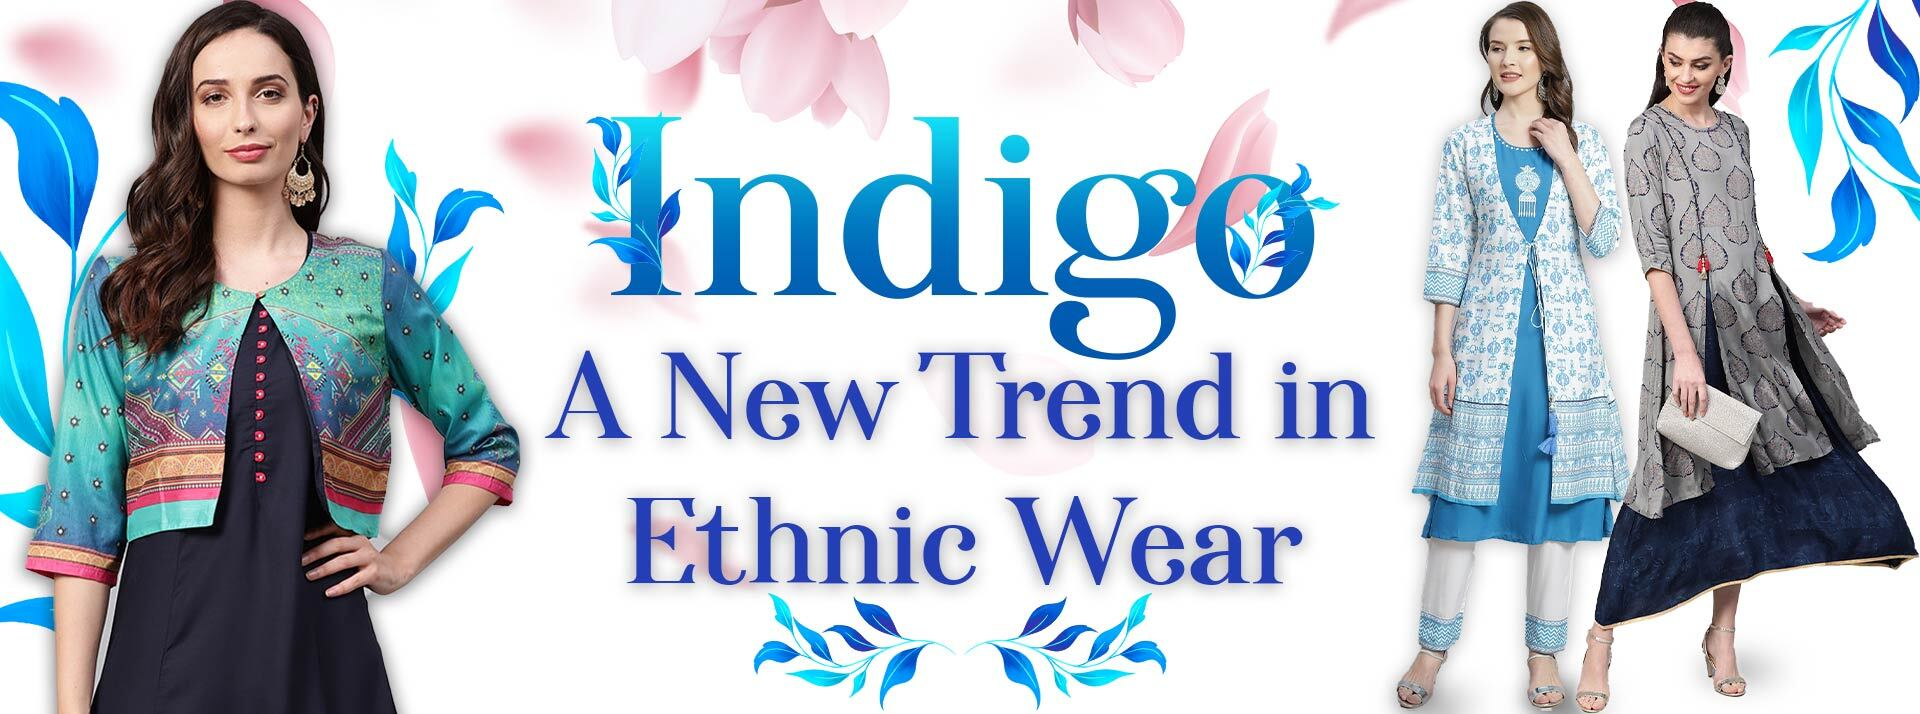 Indigo Dresses: A New Trend in Ethnic Wear